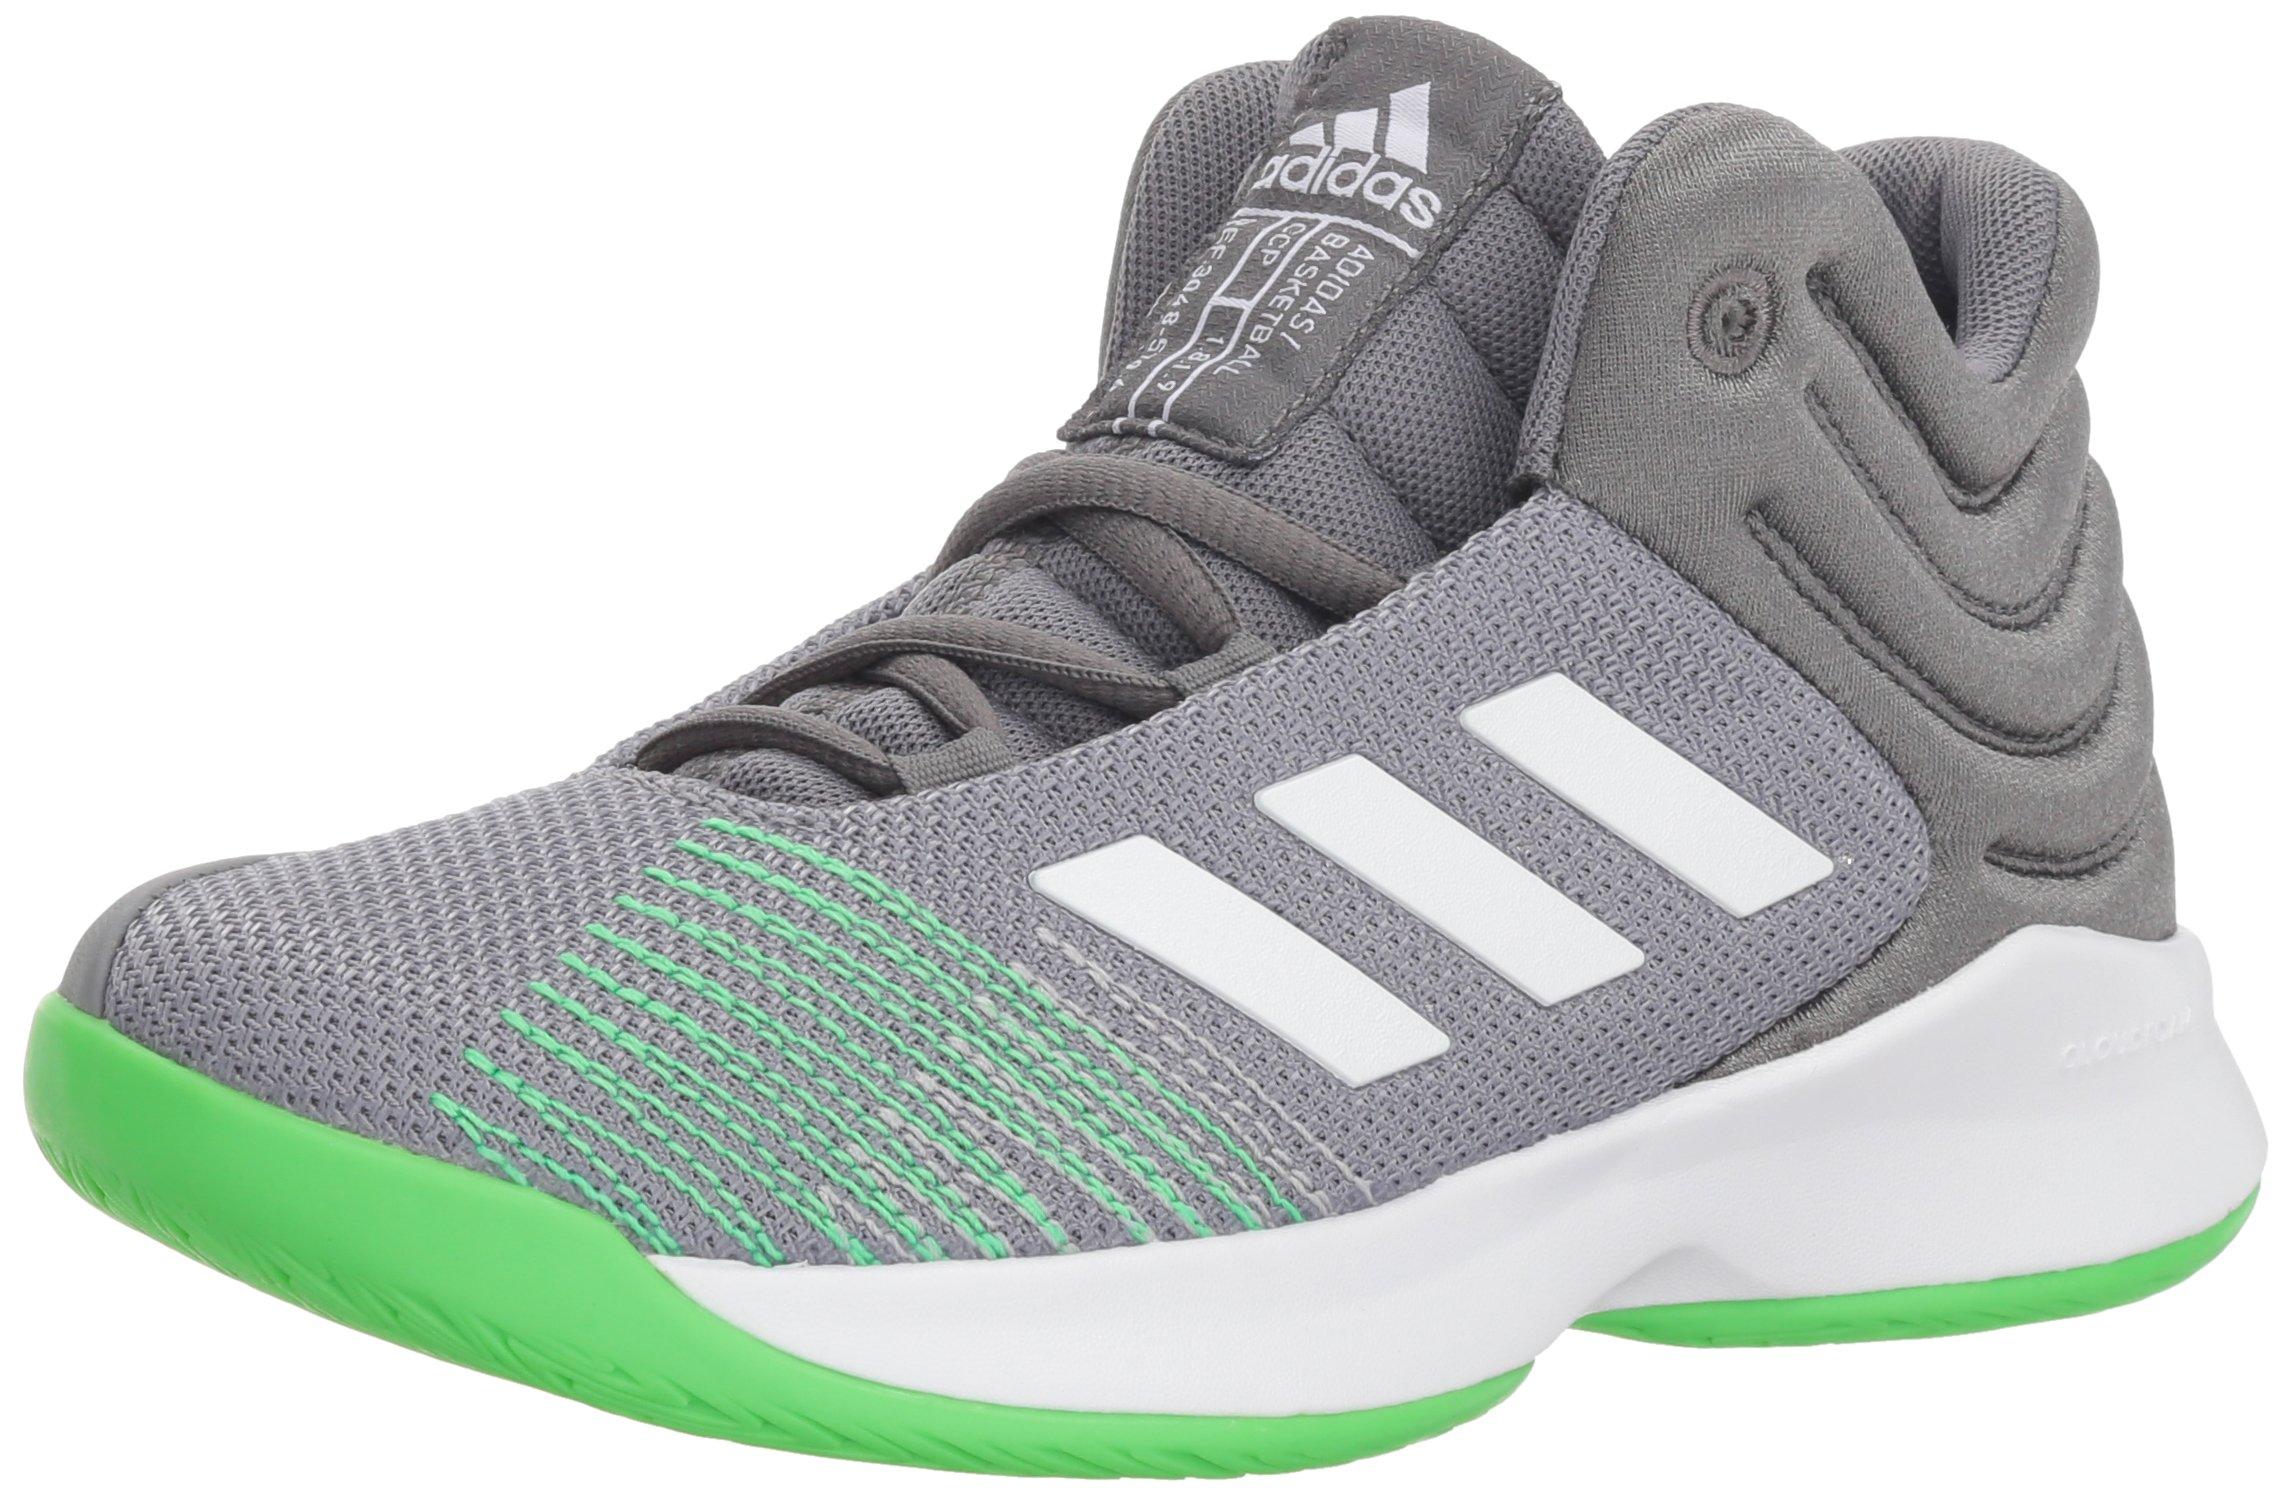 adidas Unisex Pro Spark 2018 K Basketball Shoe, Grey Four/White/Shock Lime, 1.5 M US Little Kid